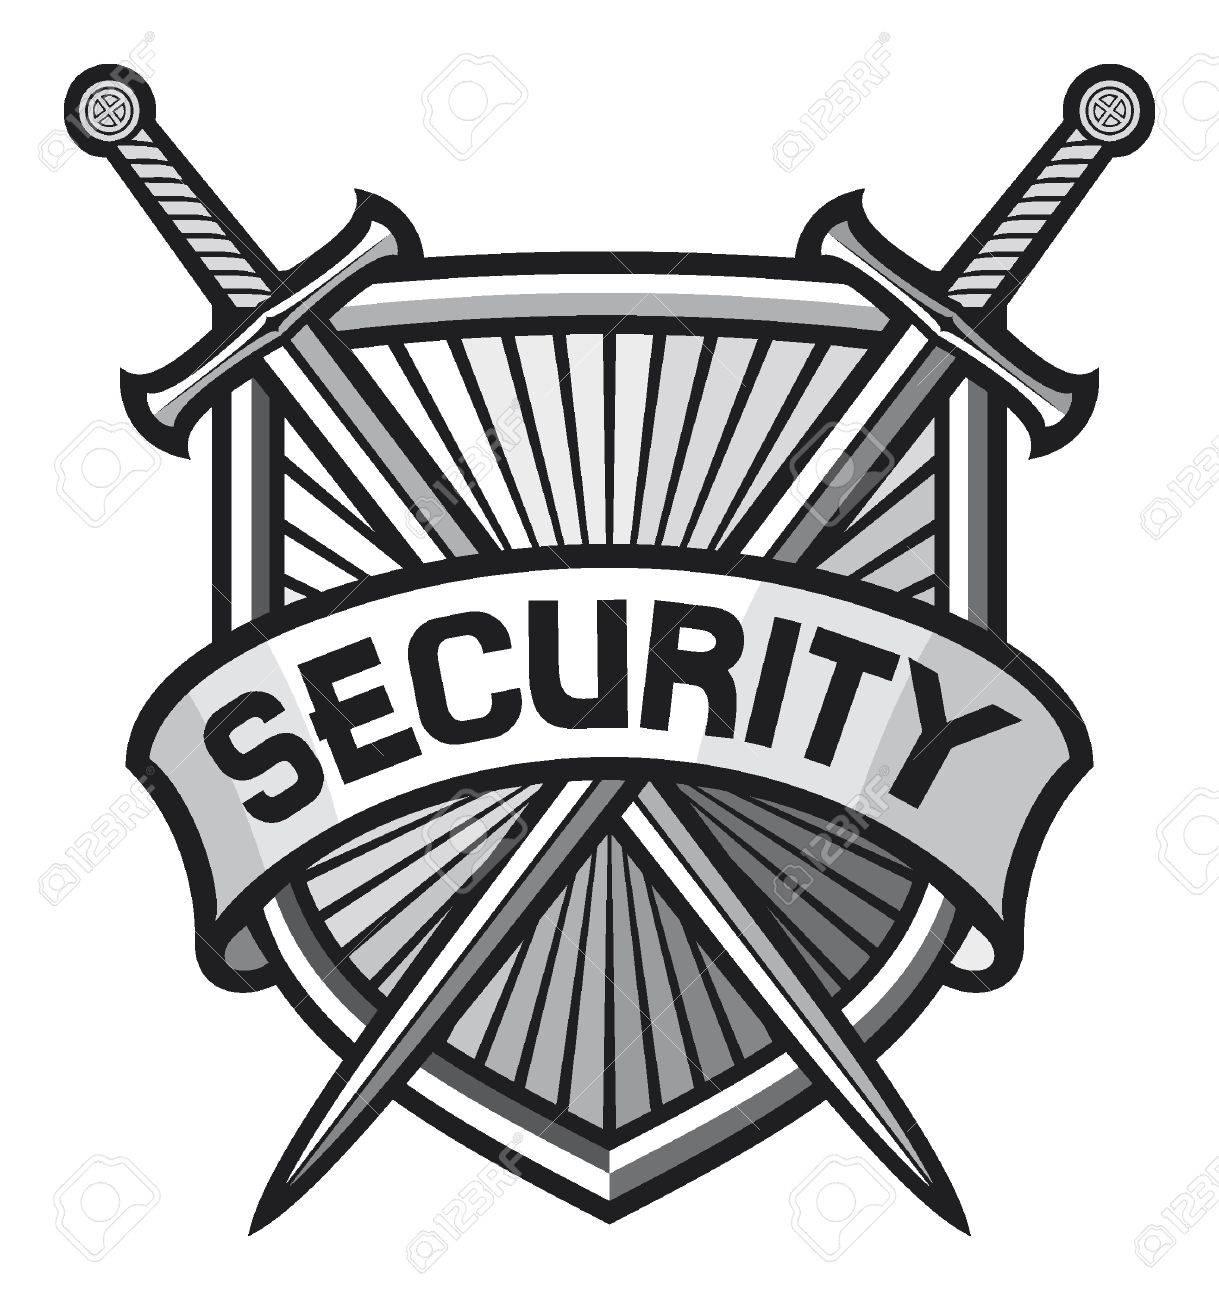 Metallic Security Shield Security Sign Security Symbol Secure